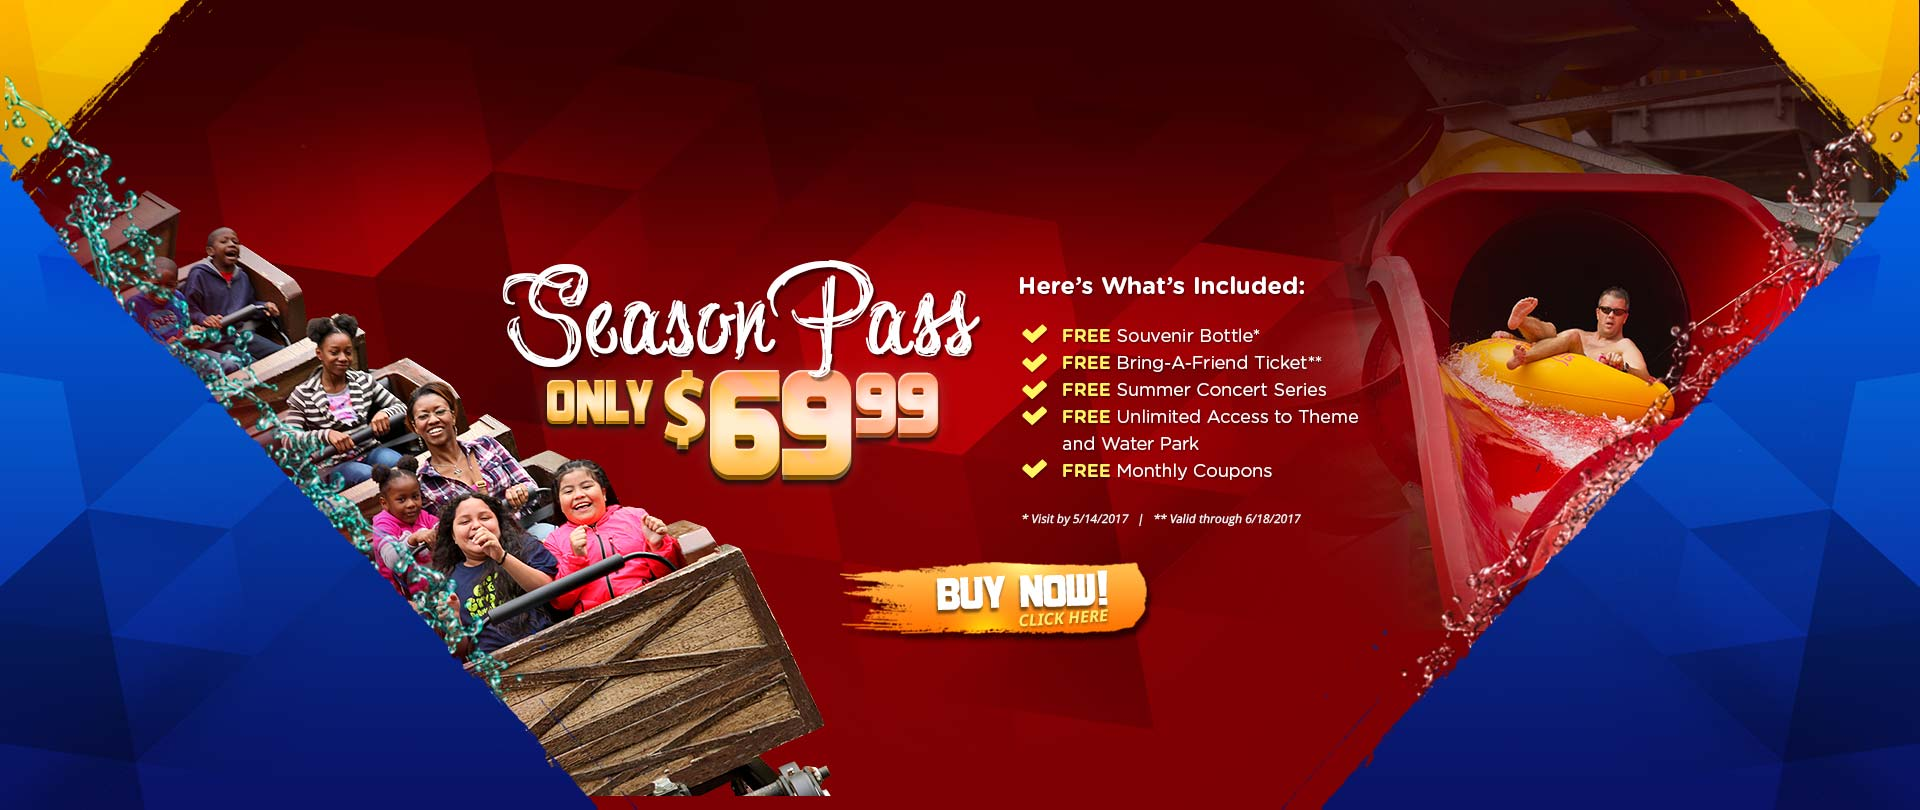 Magic springs discount coupon